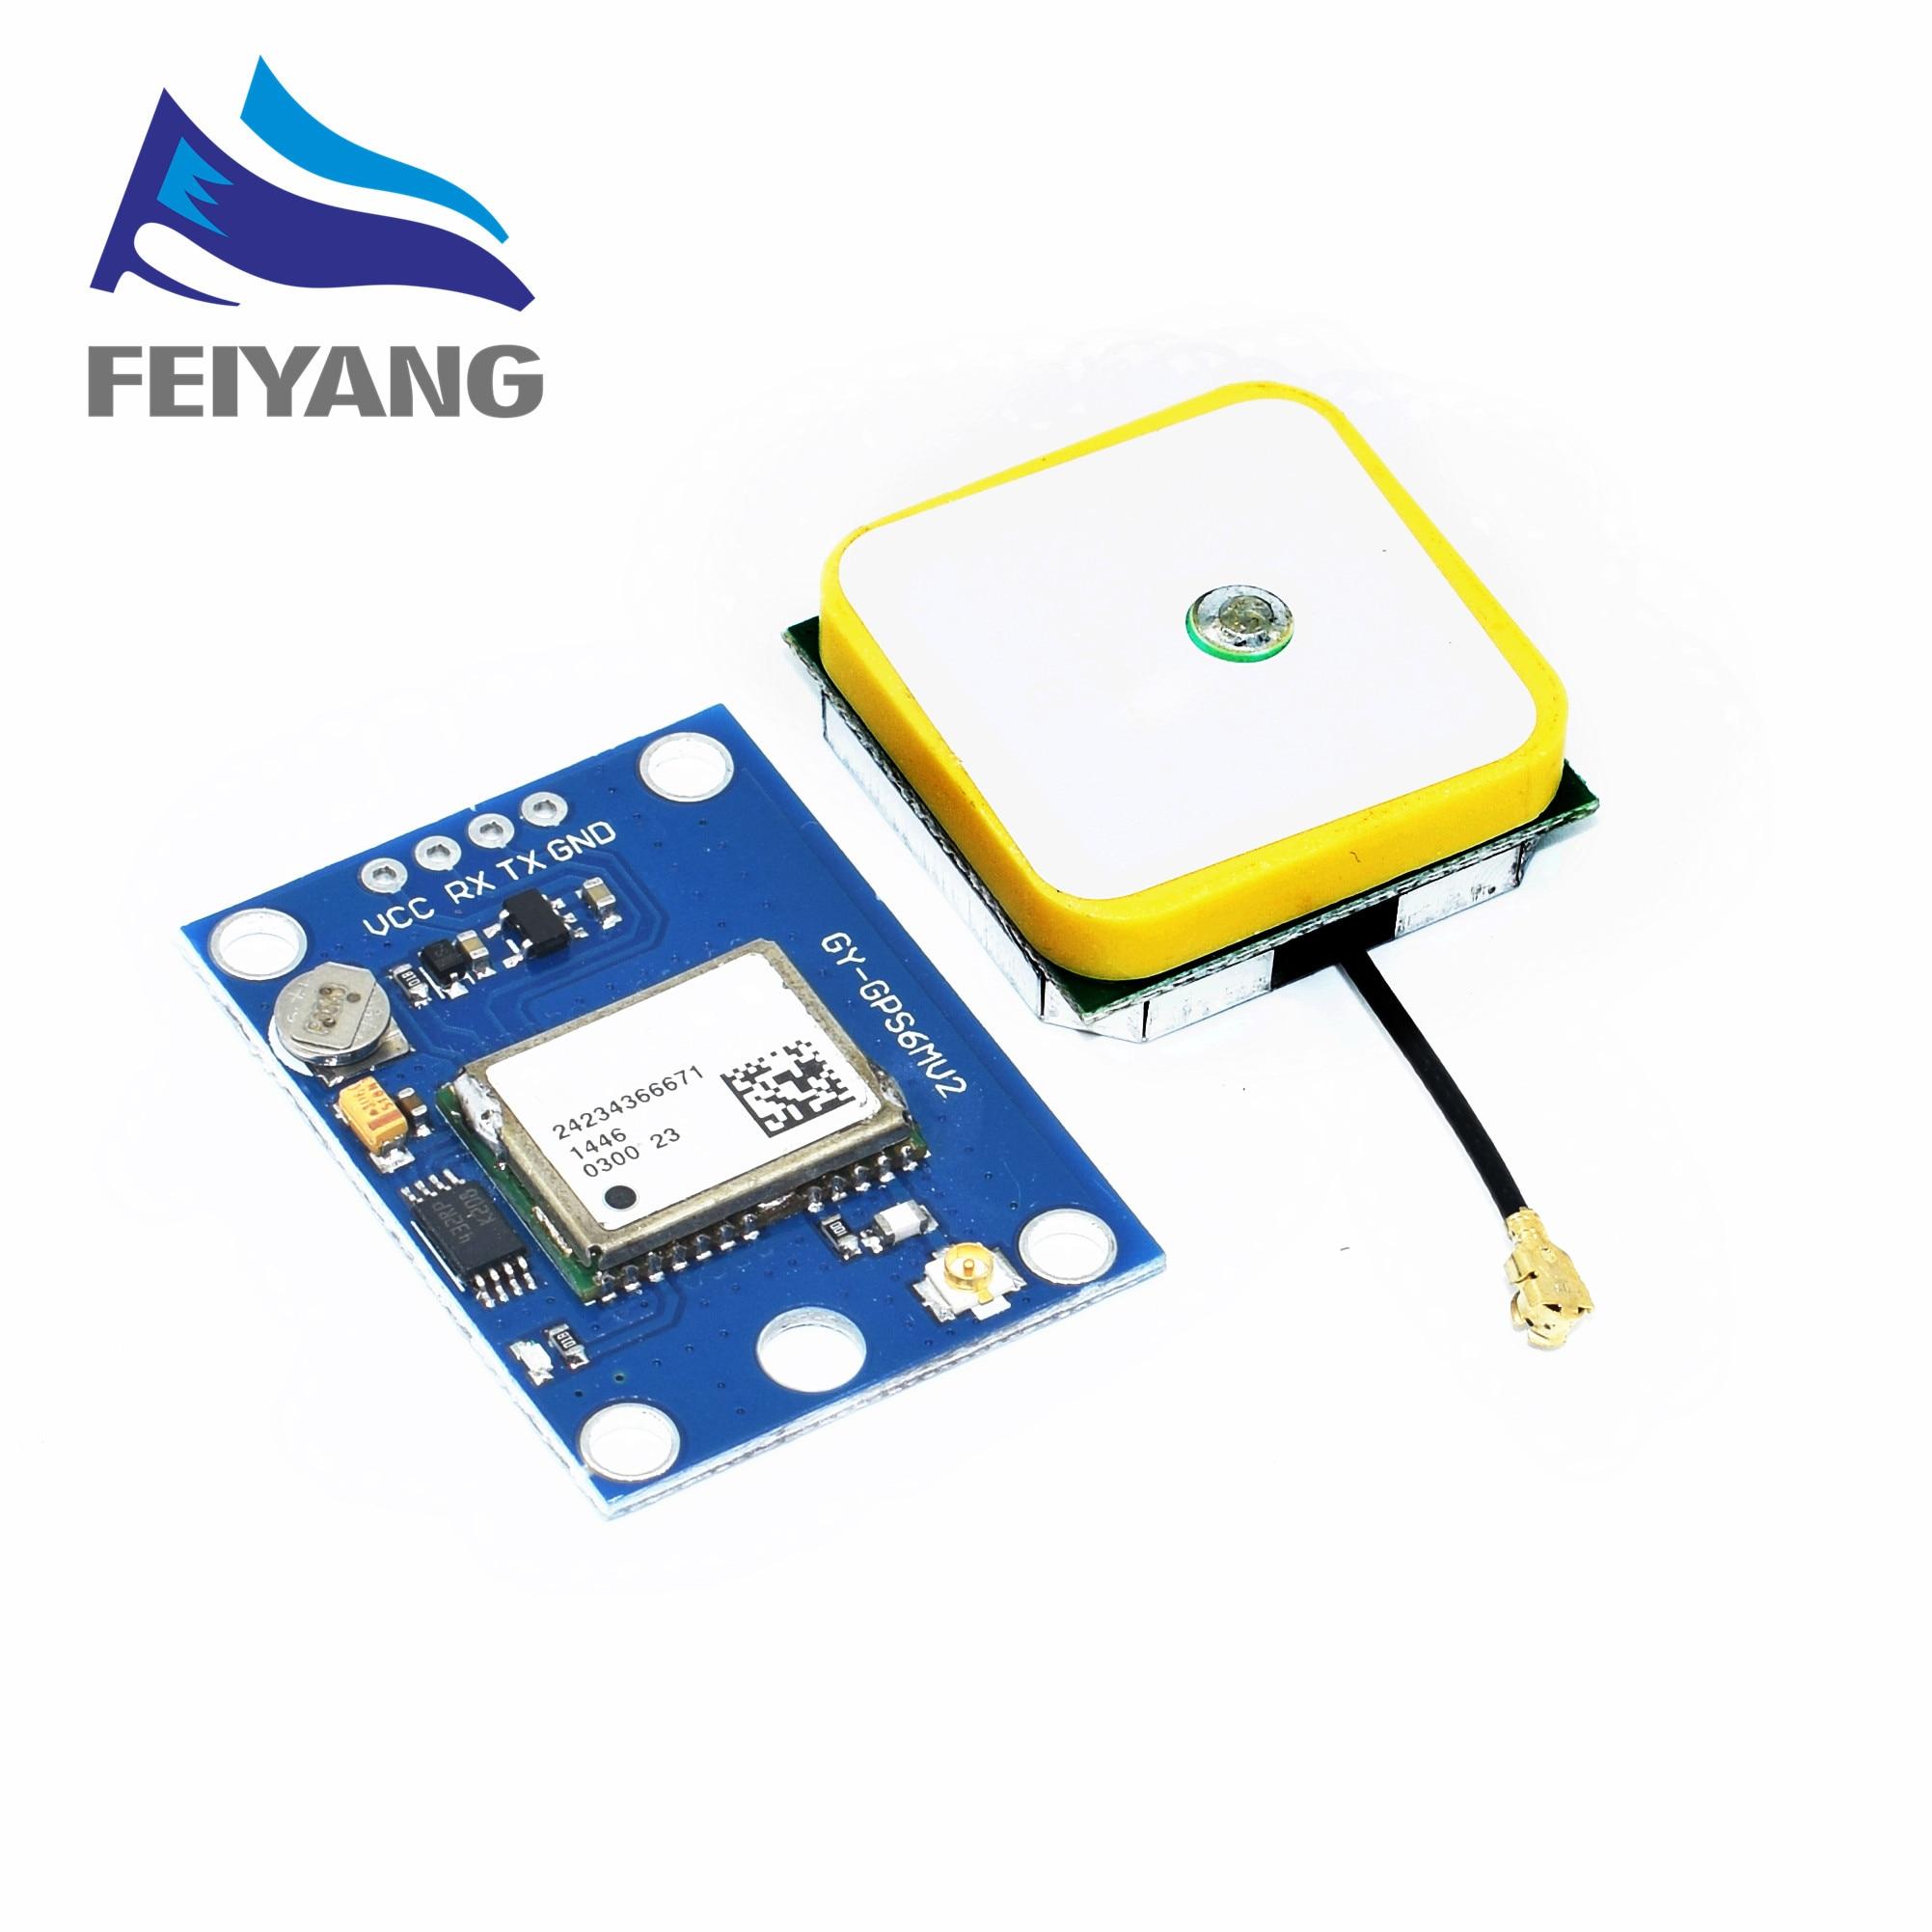 10pcs lot GY NEO6MV2 new GPS module NEO6MV2 with Flight Control EEPROM MWC APM2 5 large